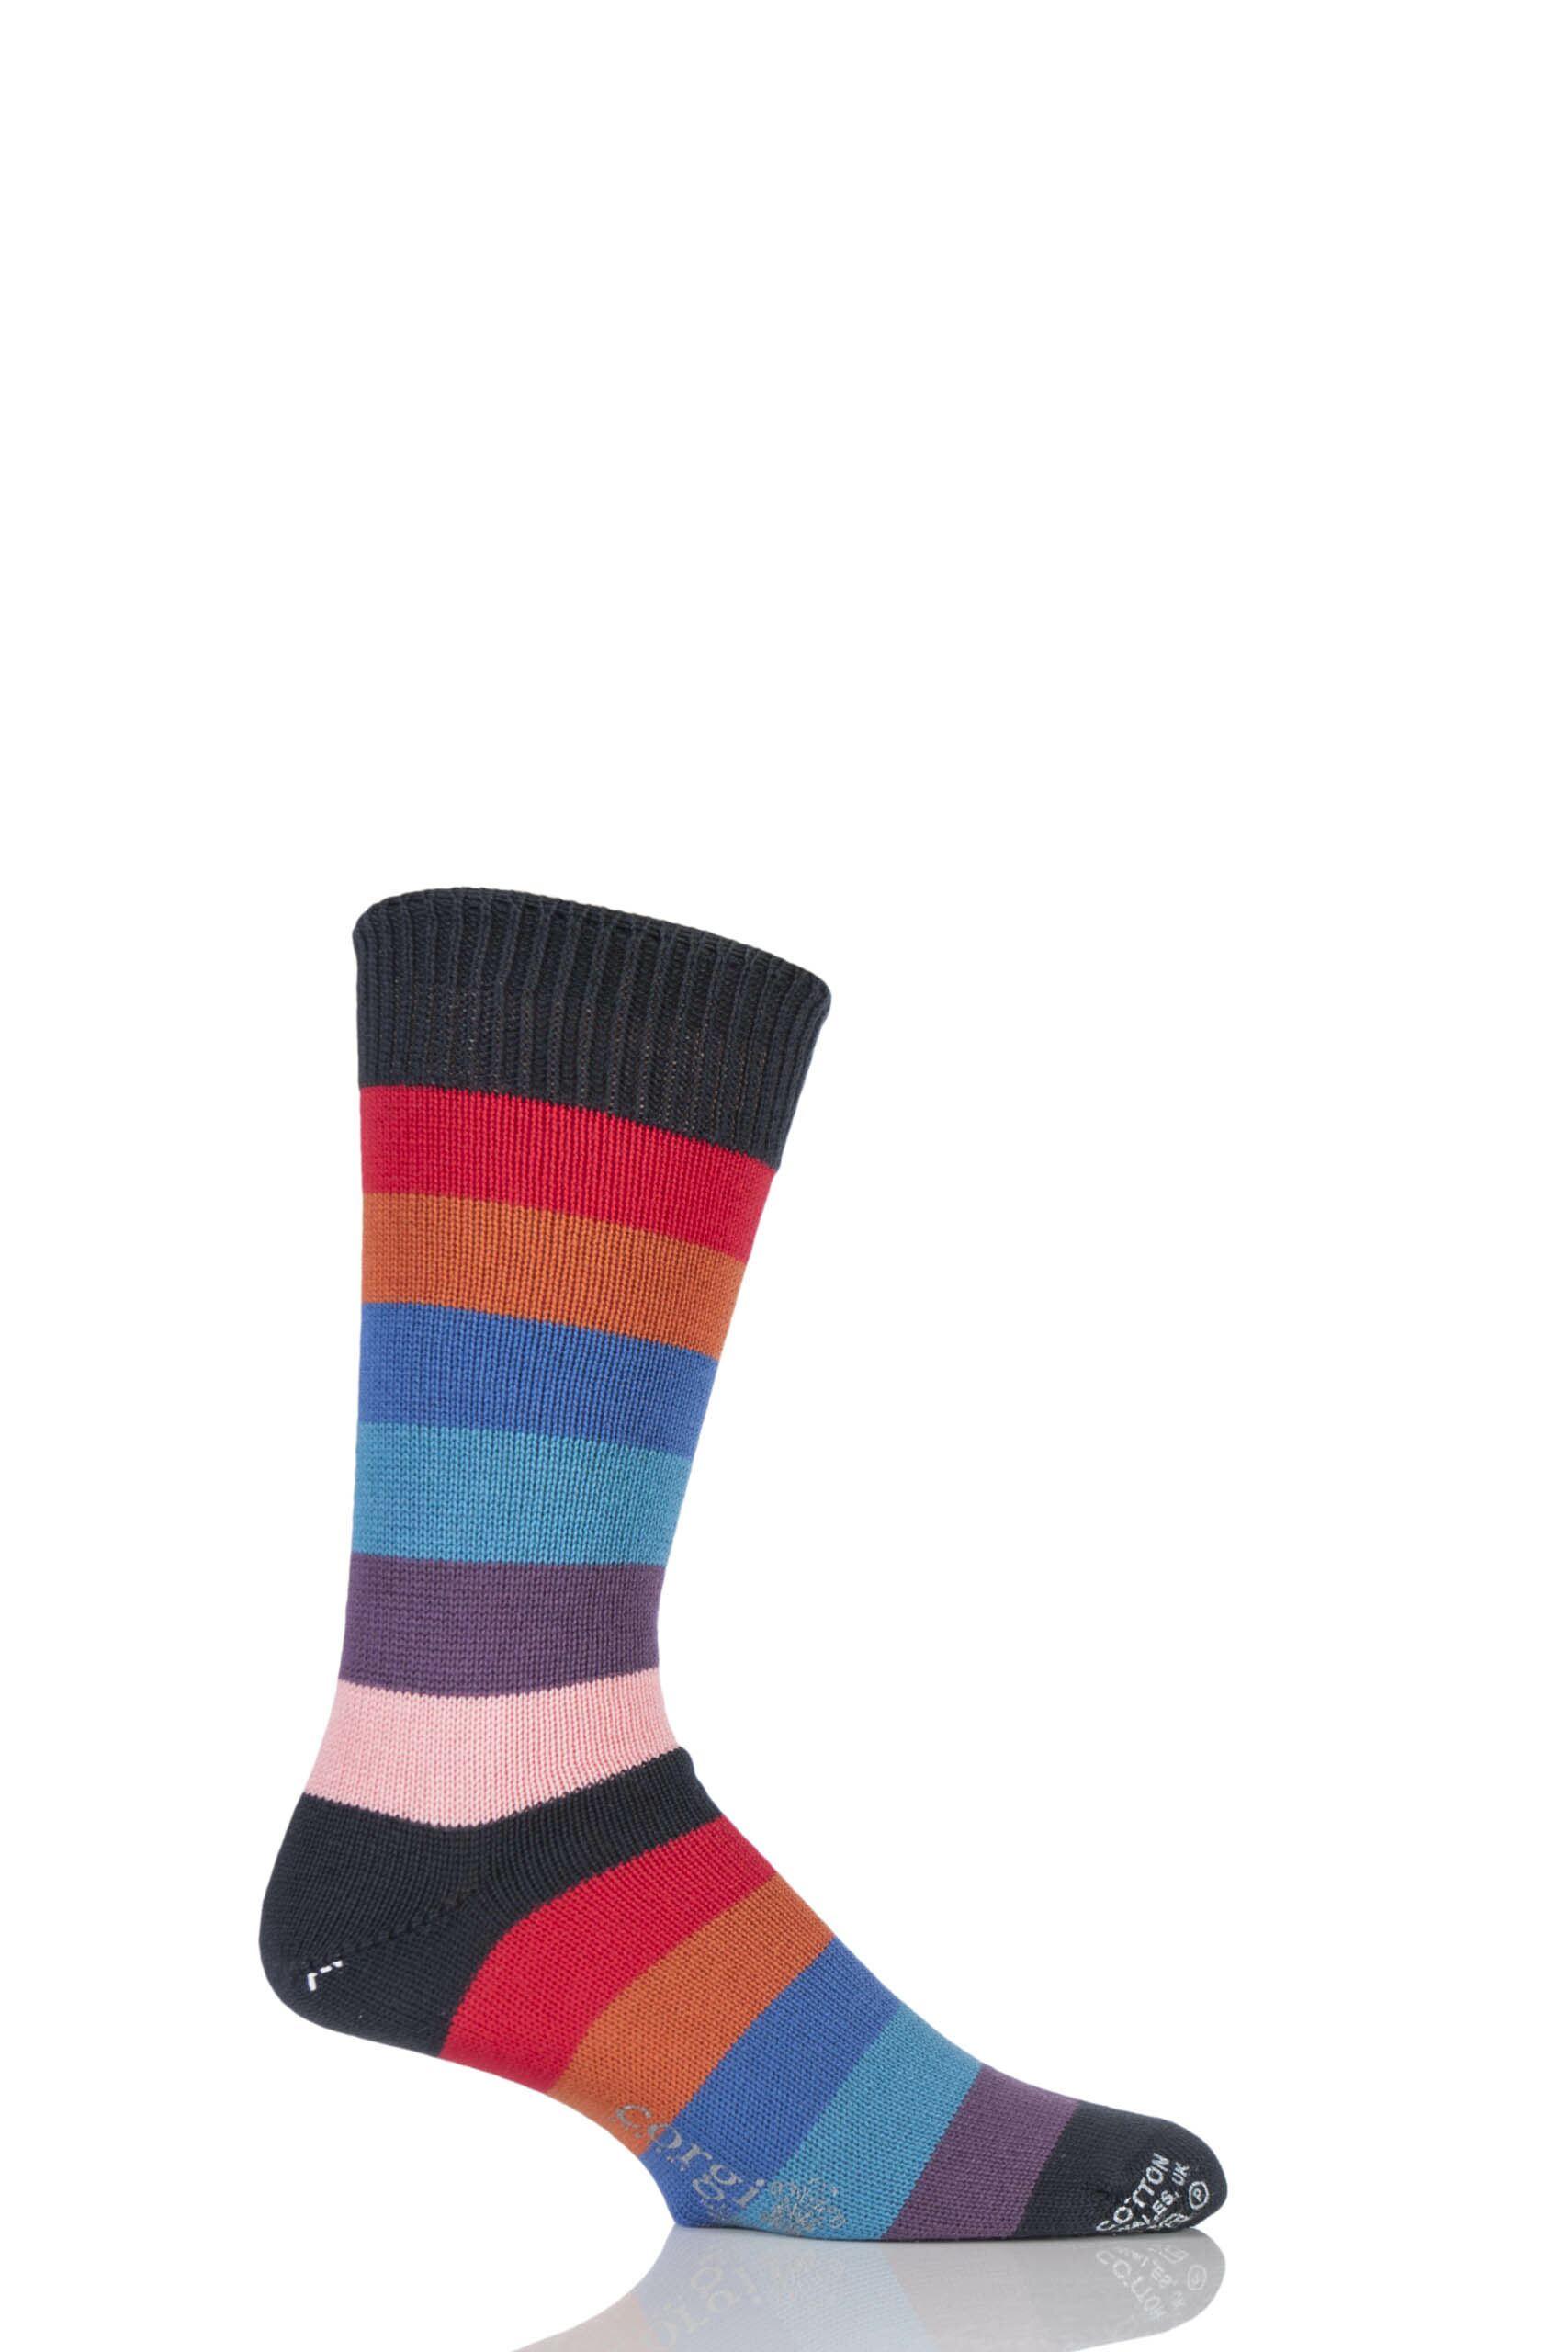 Image of 1 Pair Anthracite 100% Cotton Wide Striped Socks Men's 10-12 Mens - Corgi